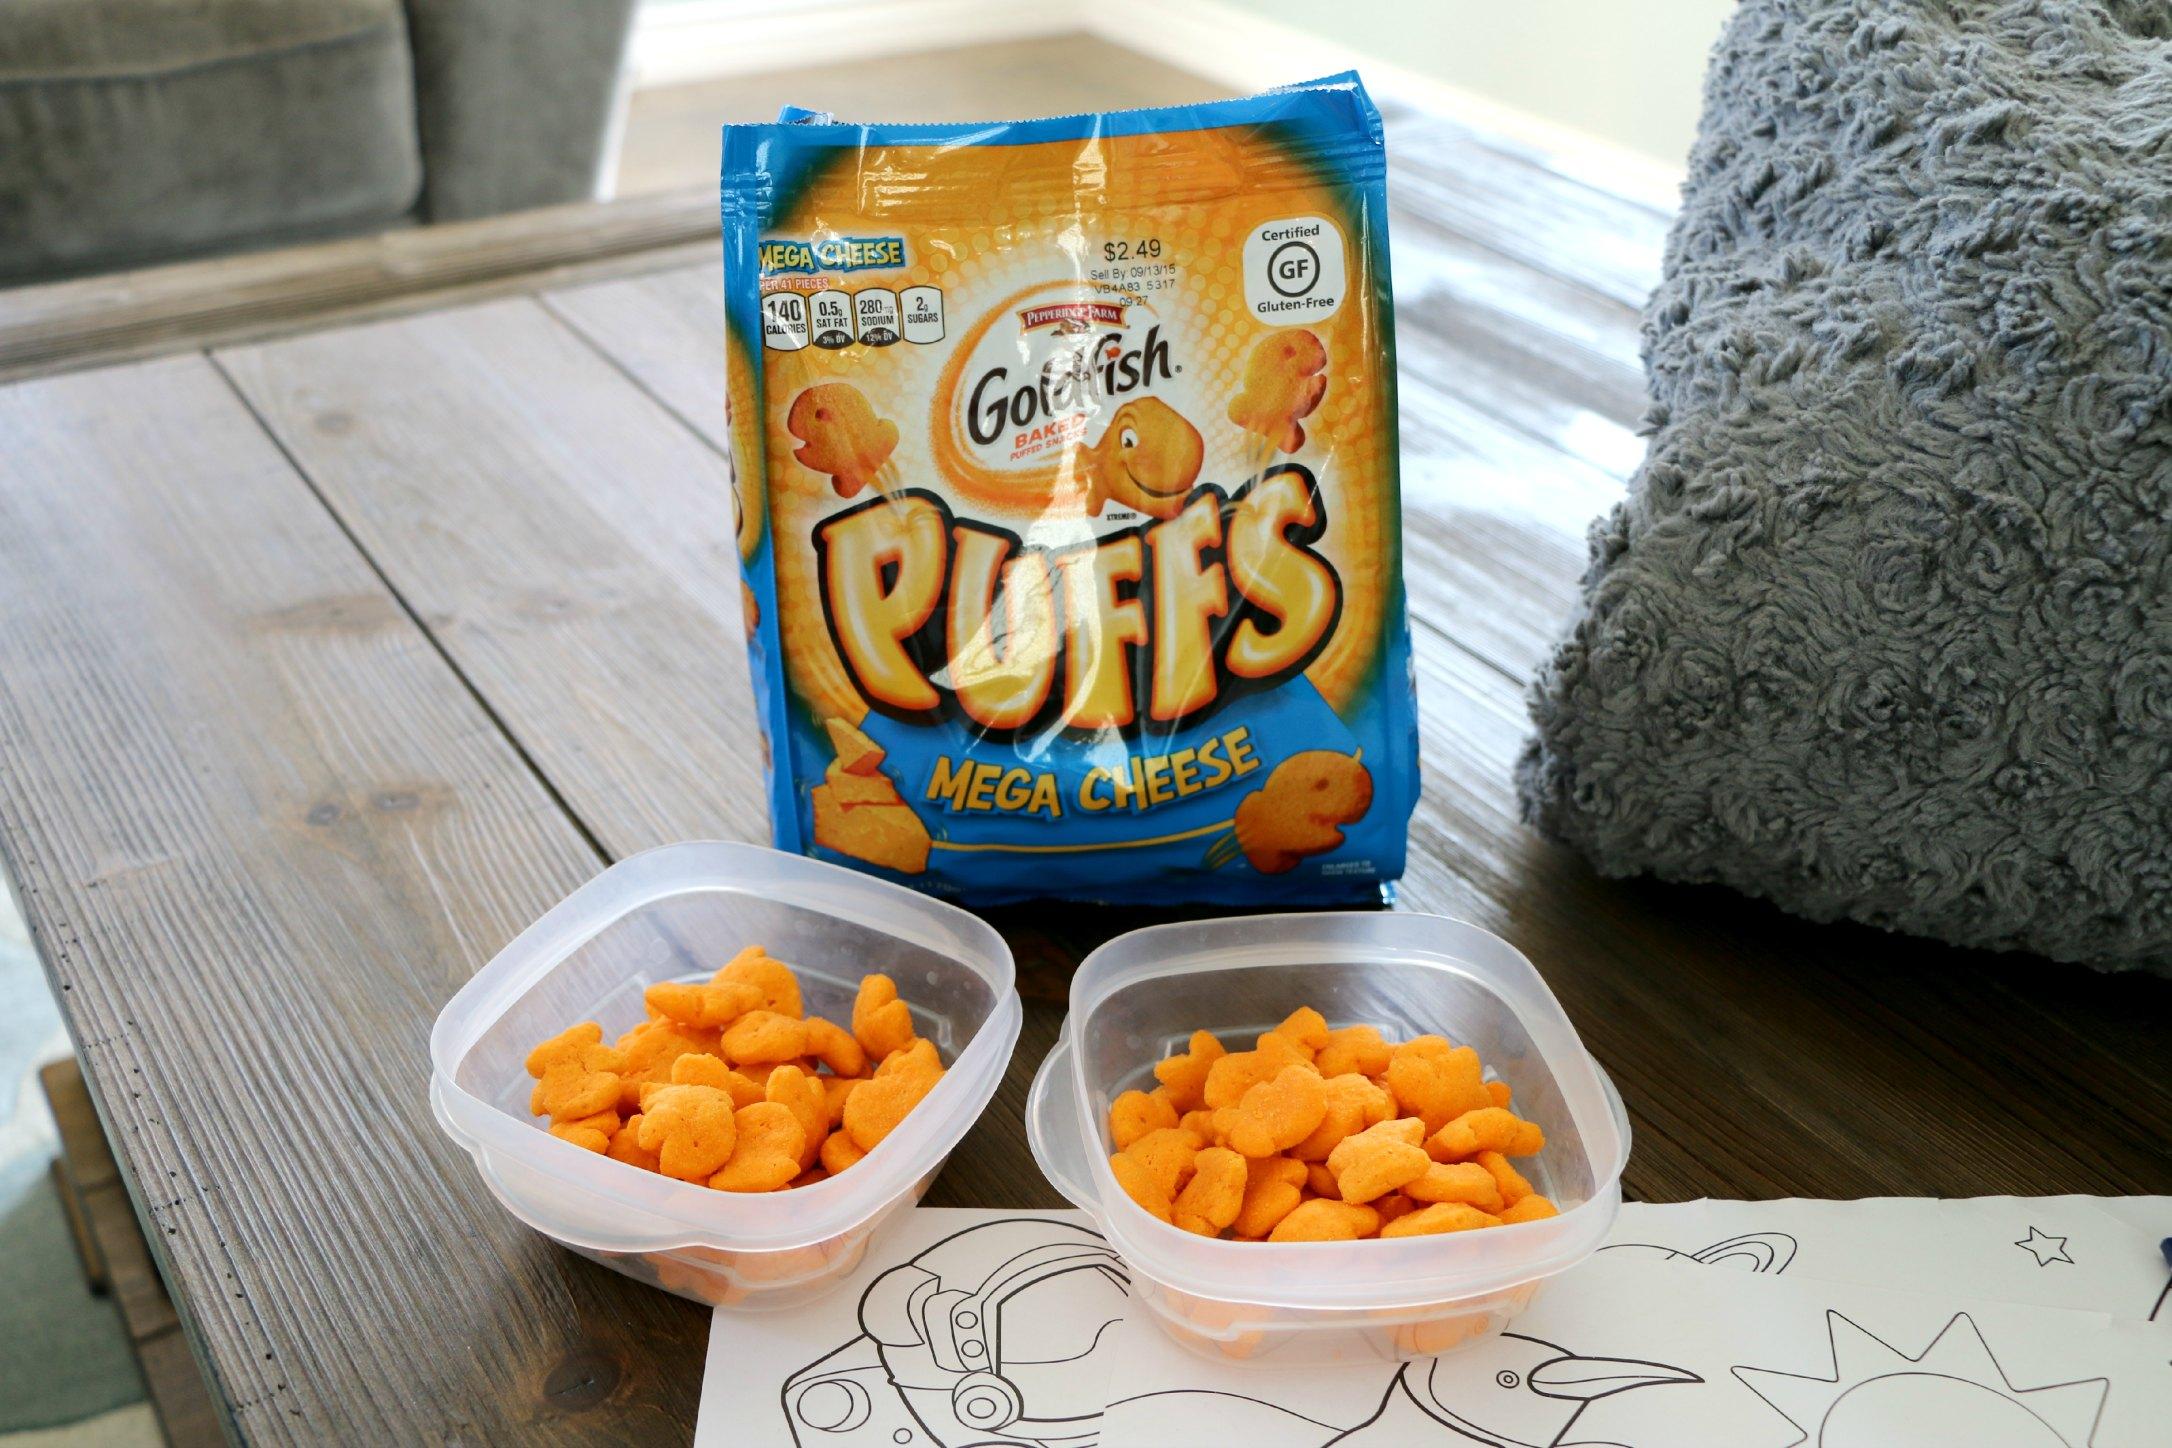 goldfish puffs mega cheese